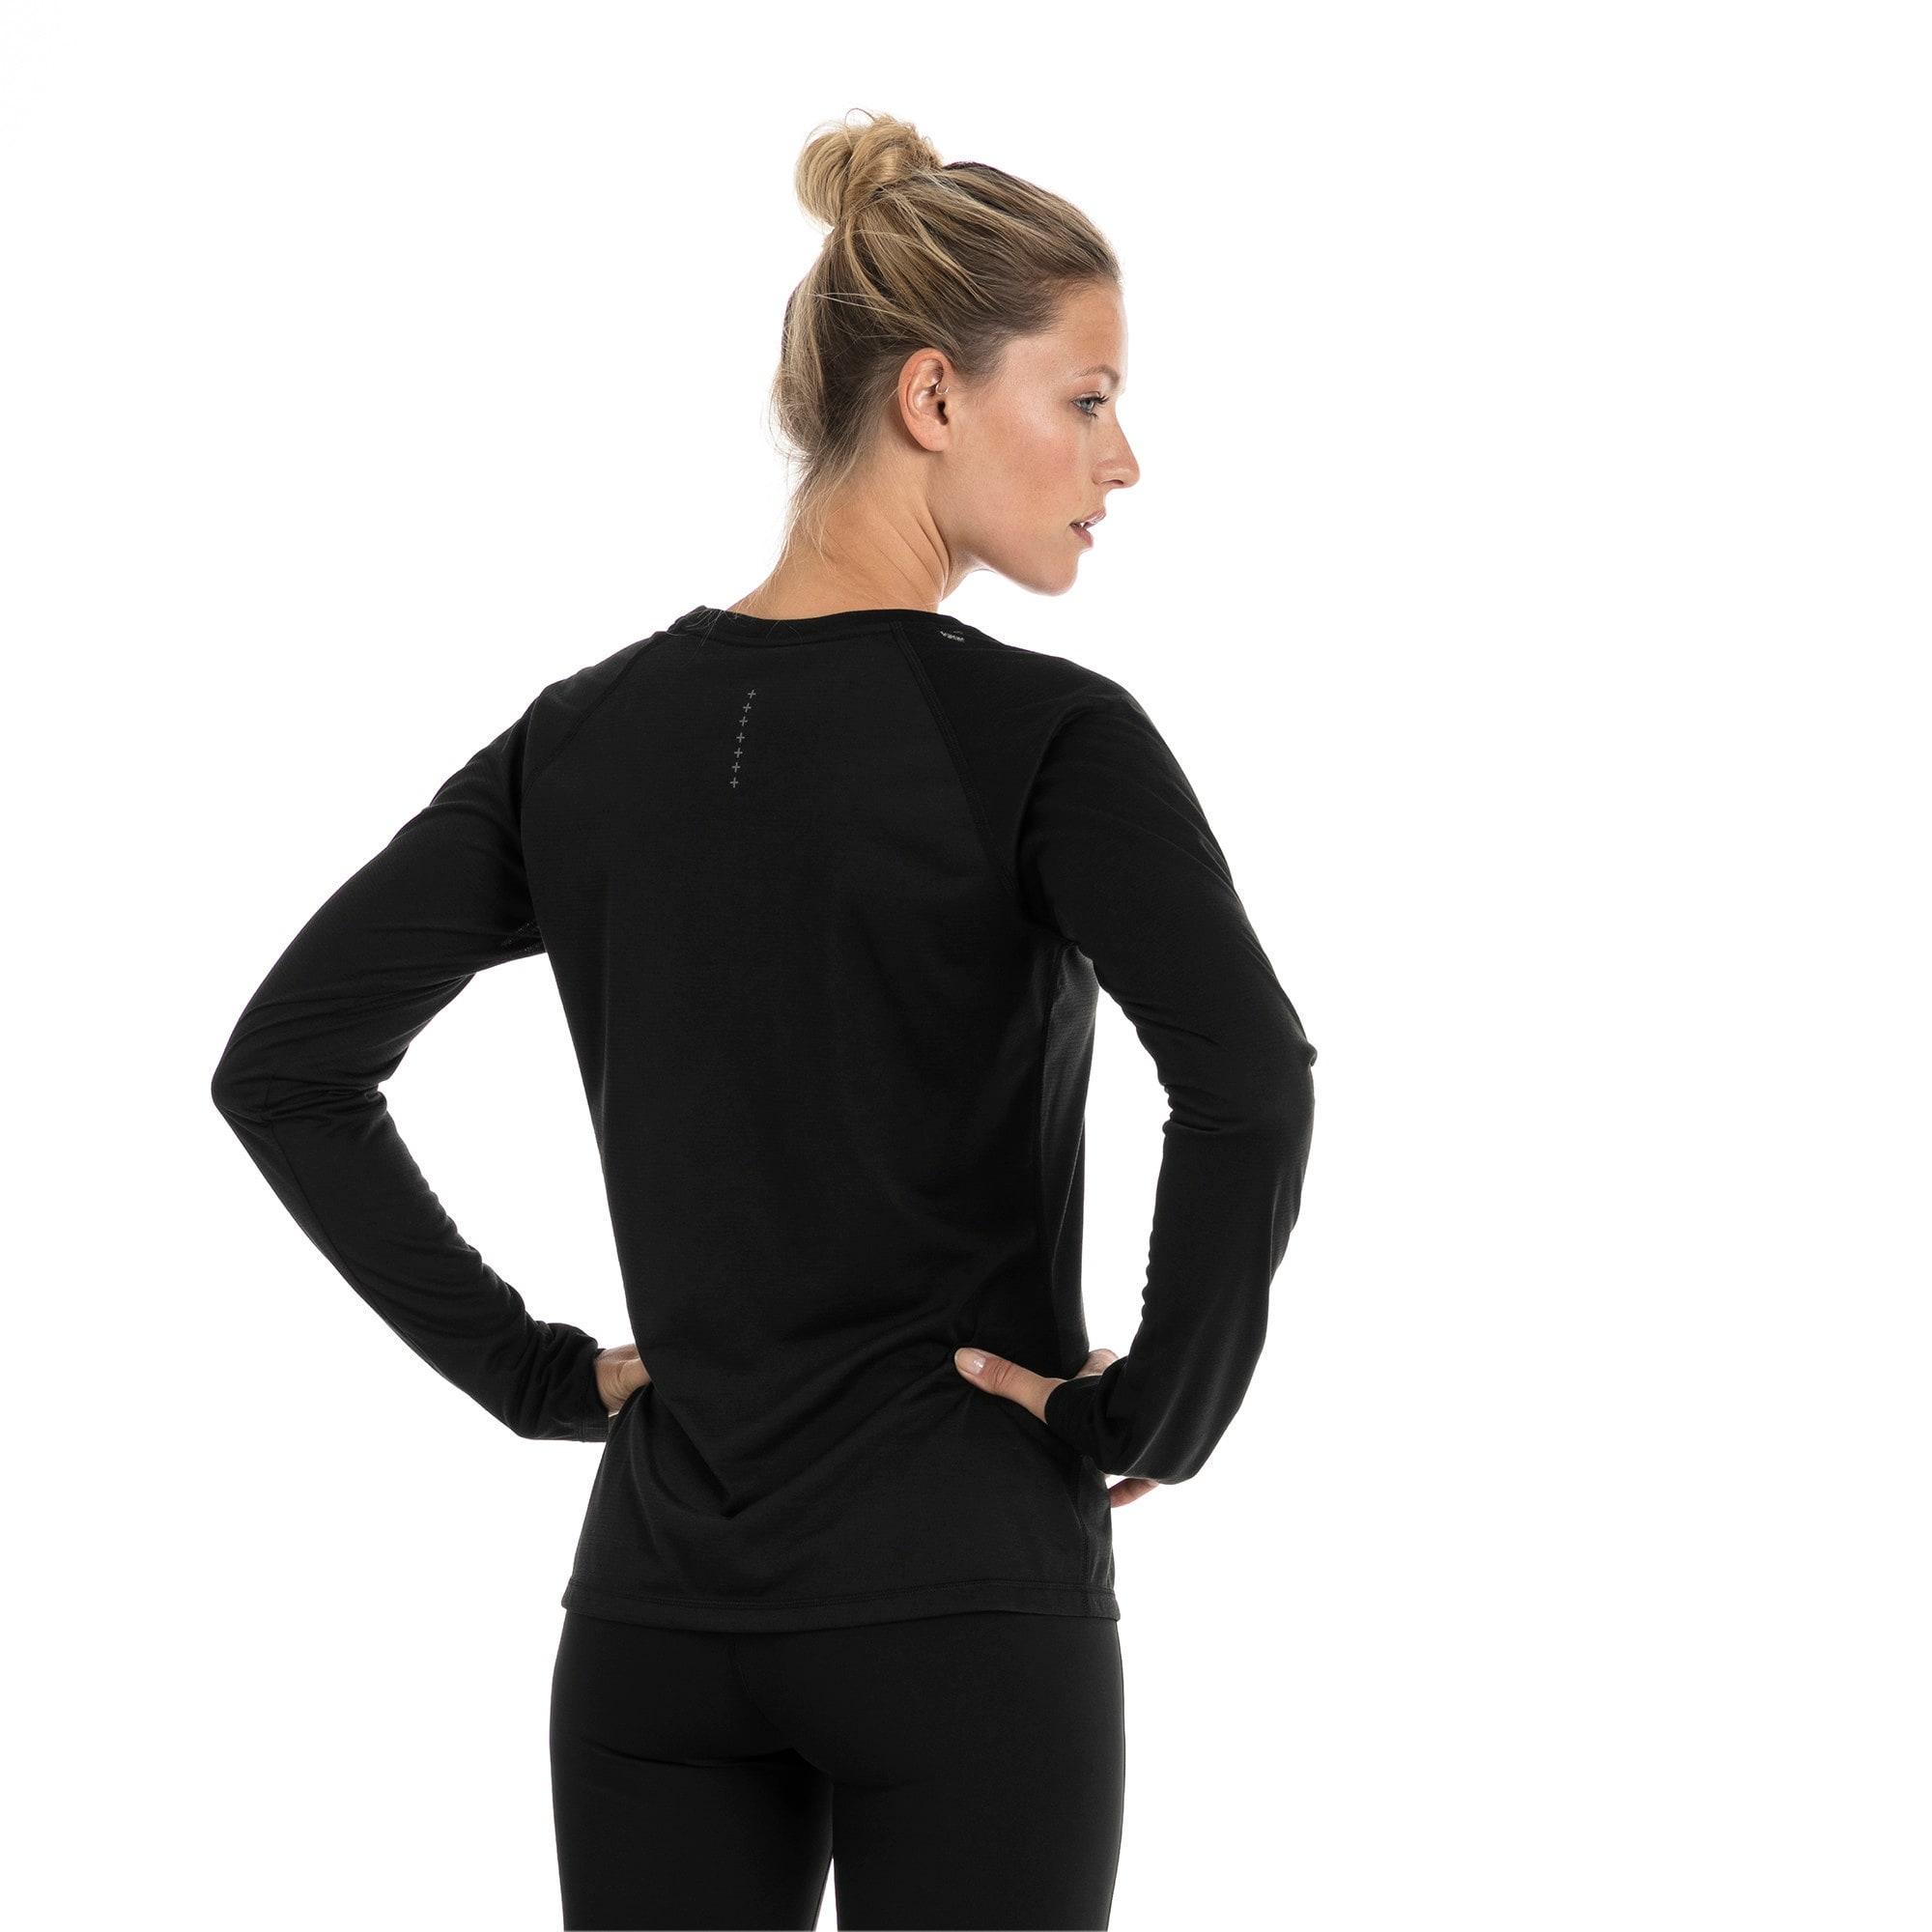 Thumbnail 2 of Running Women's IGNITE Long Sleeve, Puma Black, medium-IND